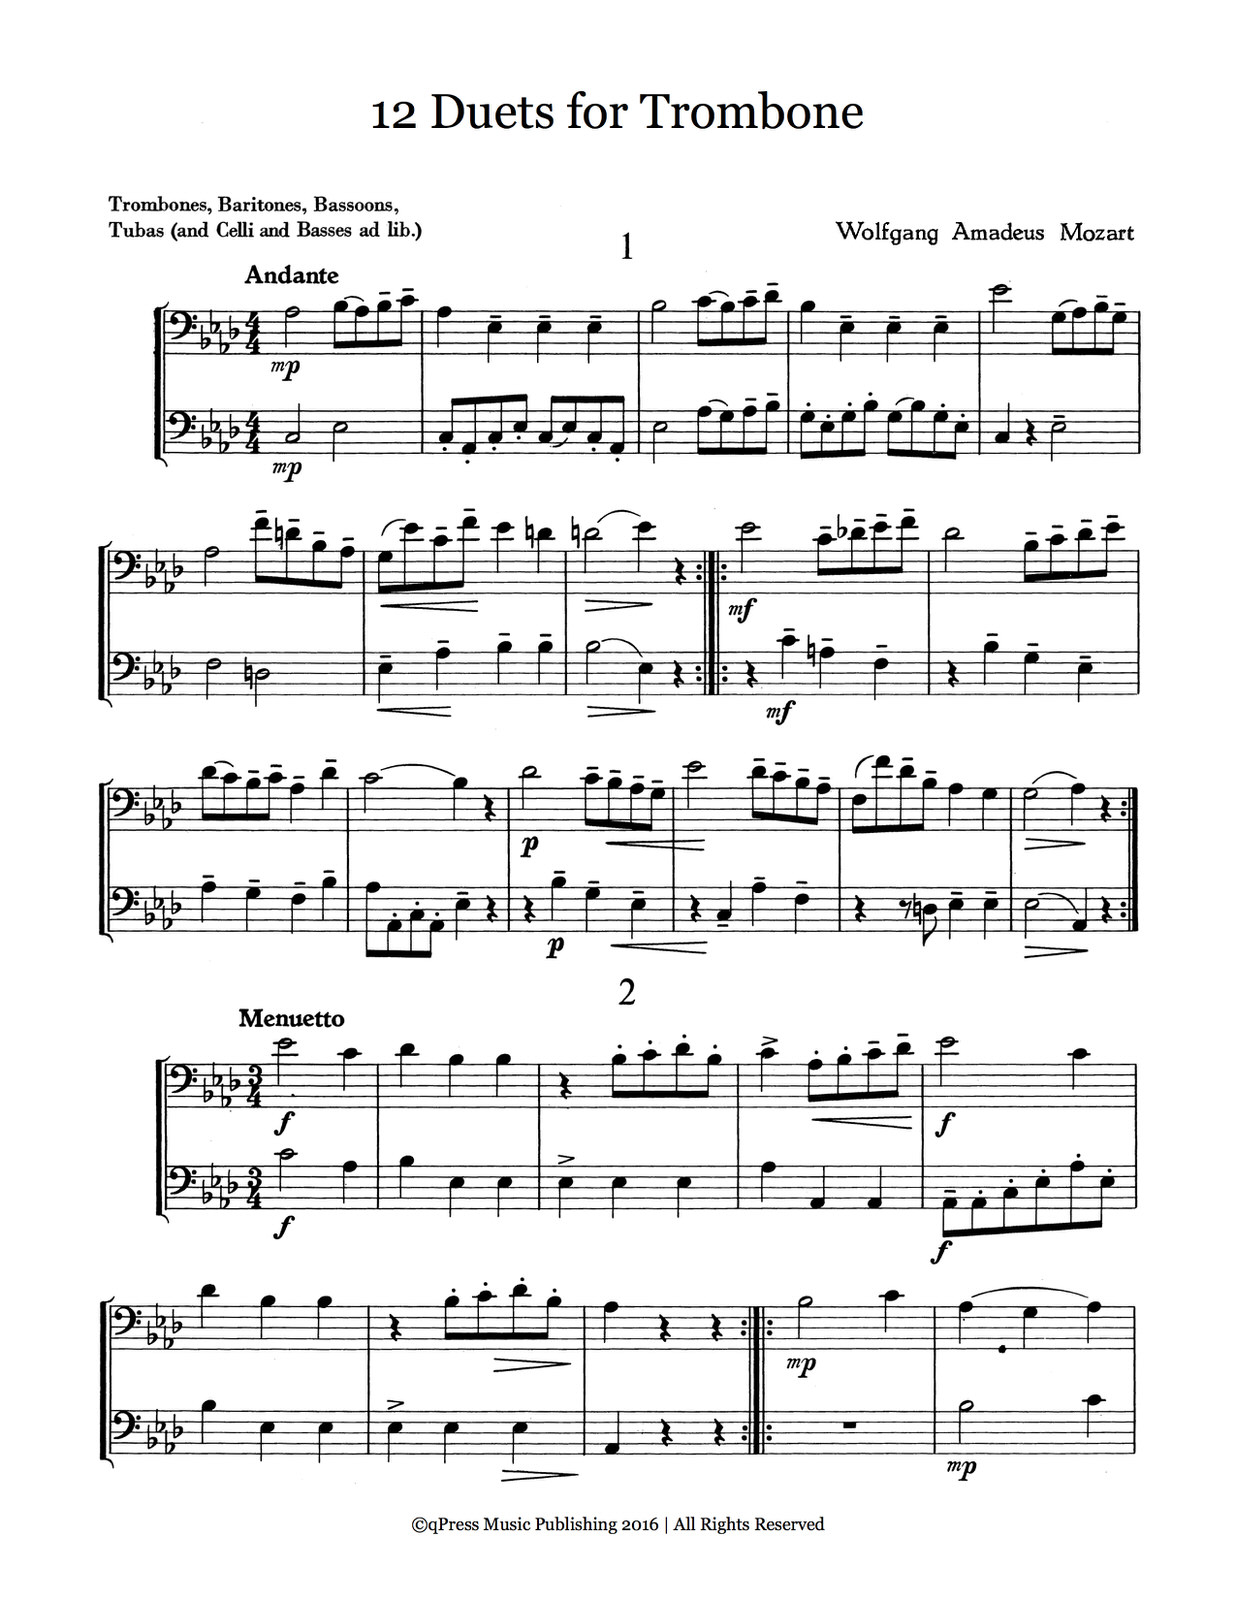 mozart-12-duets-for-trombone-2